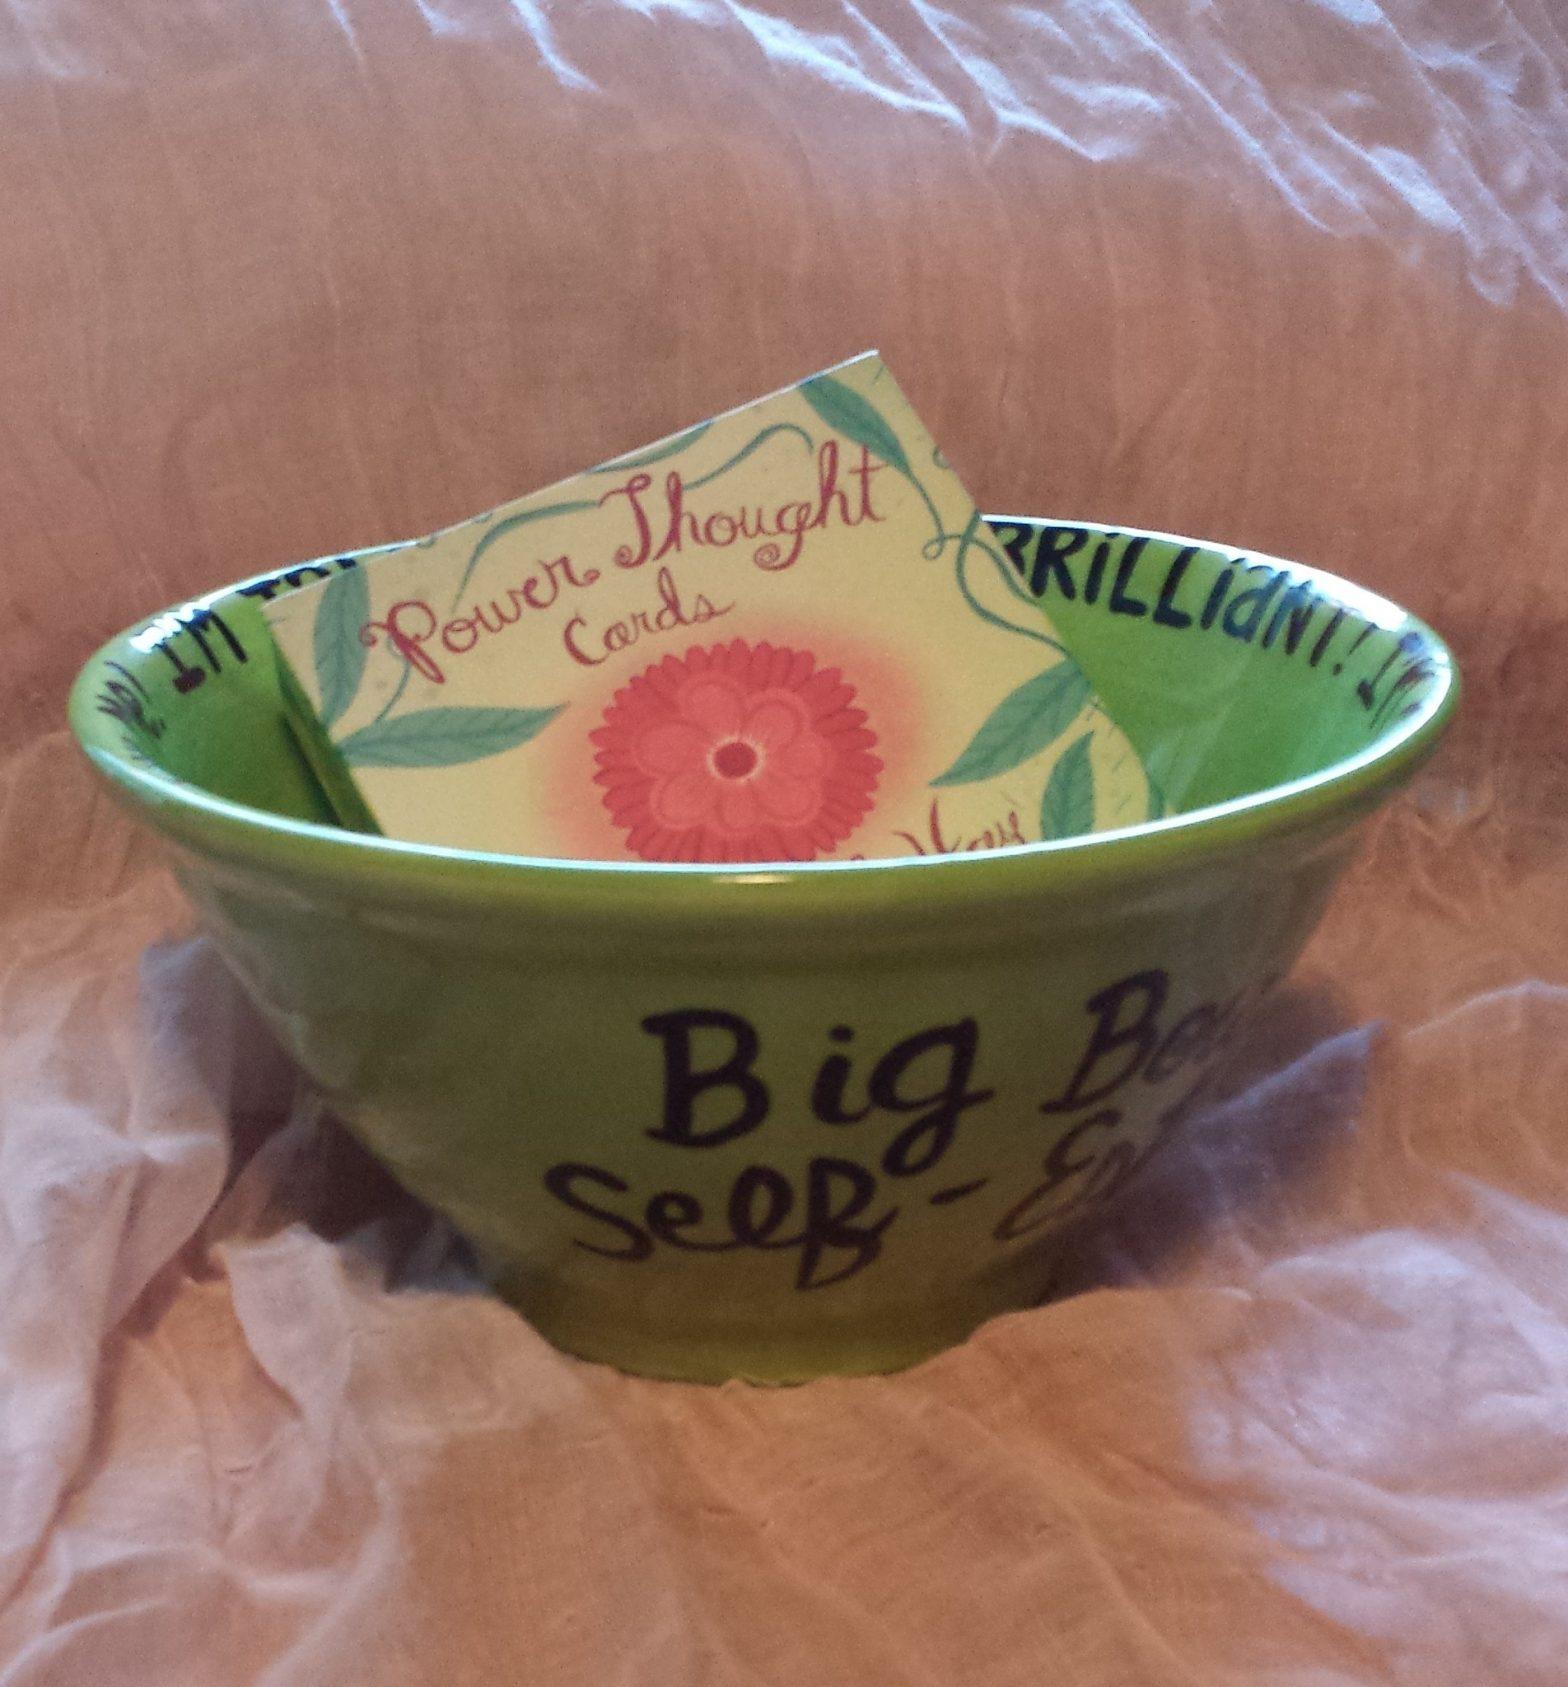 Big bowl of self-esteem